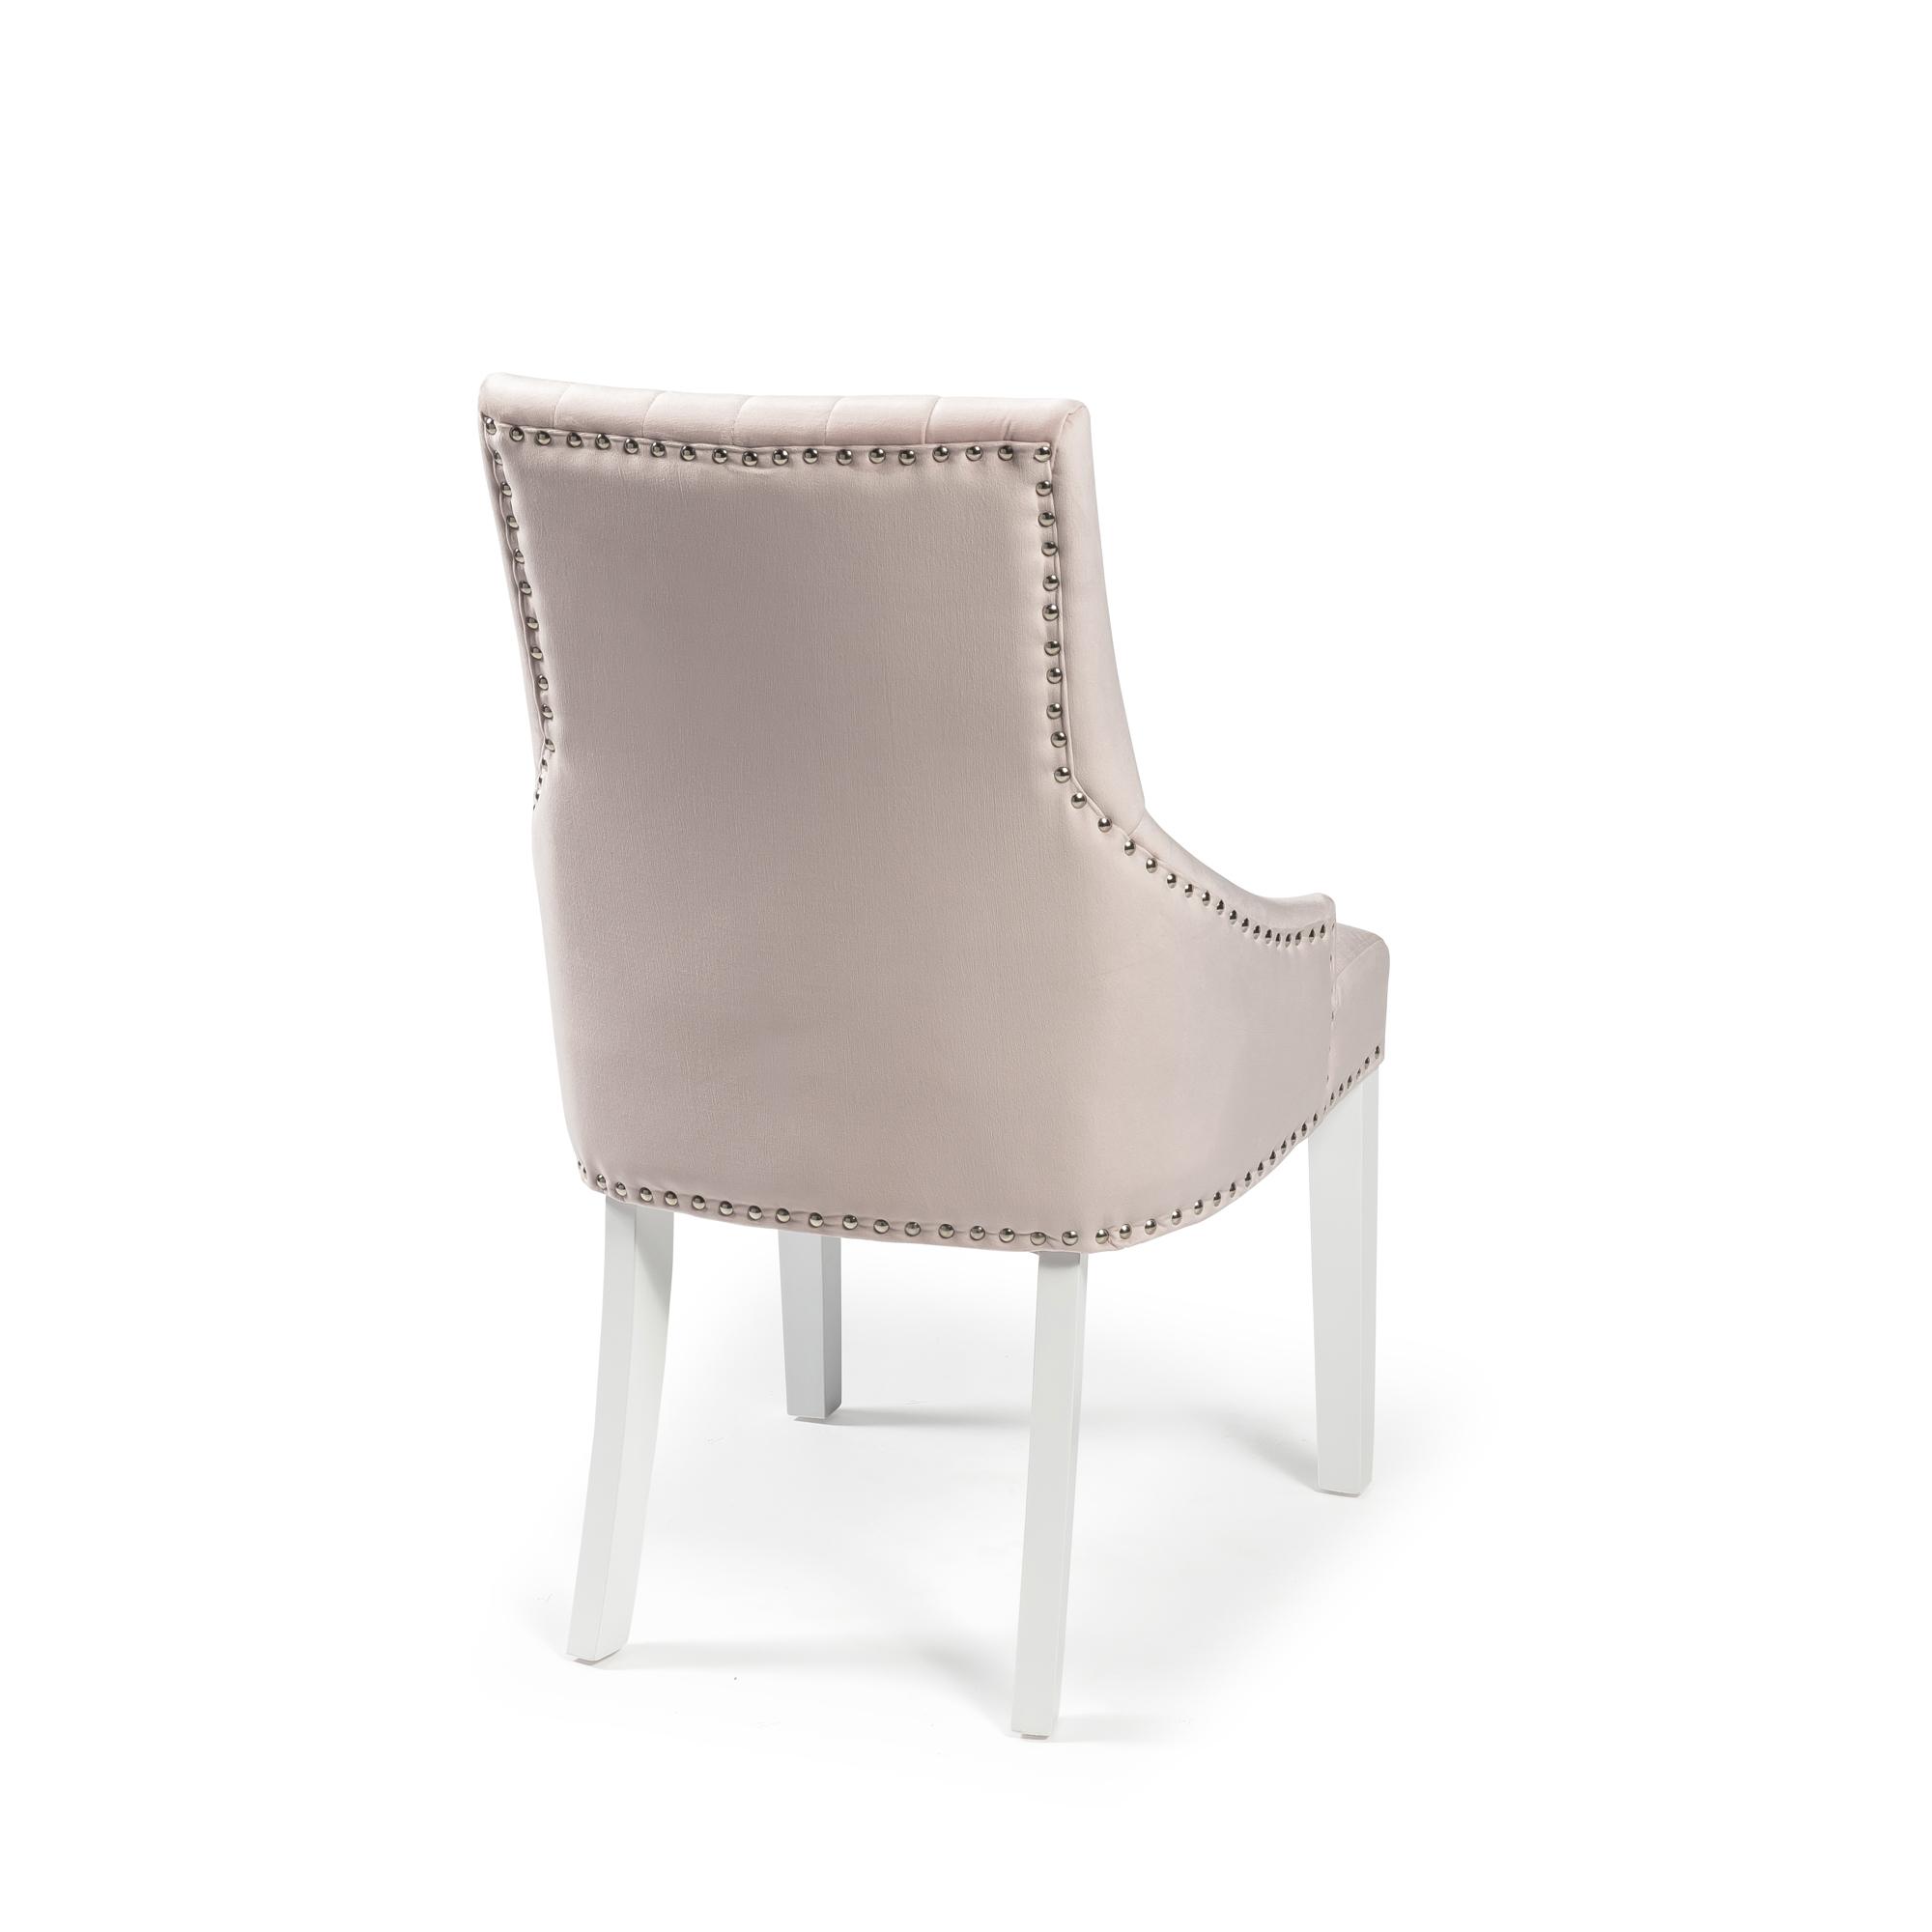 Chelsea Scoop Blush Velvet Pink Dining Chair With White Legs